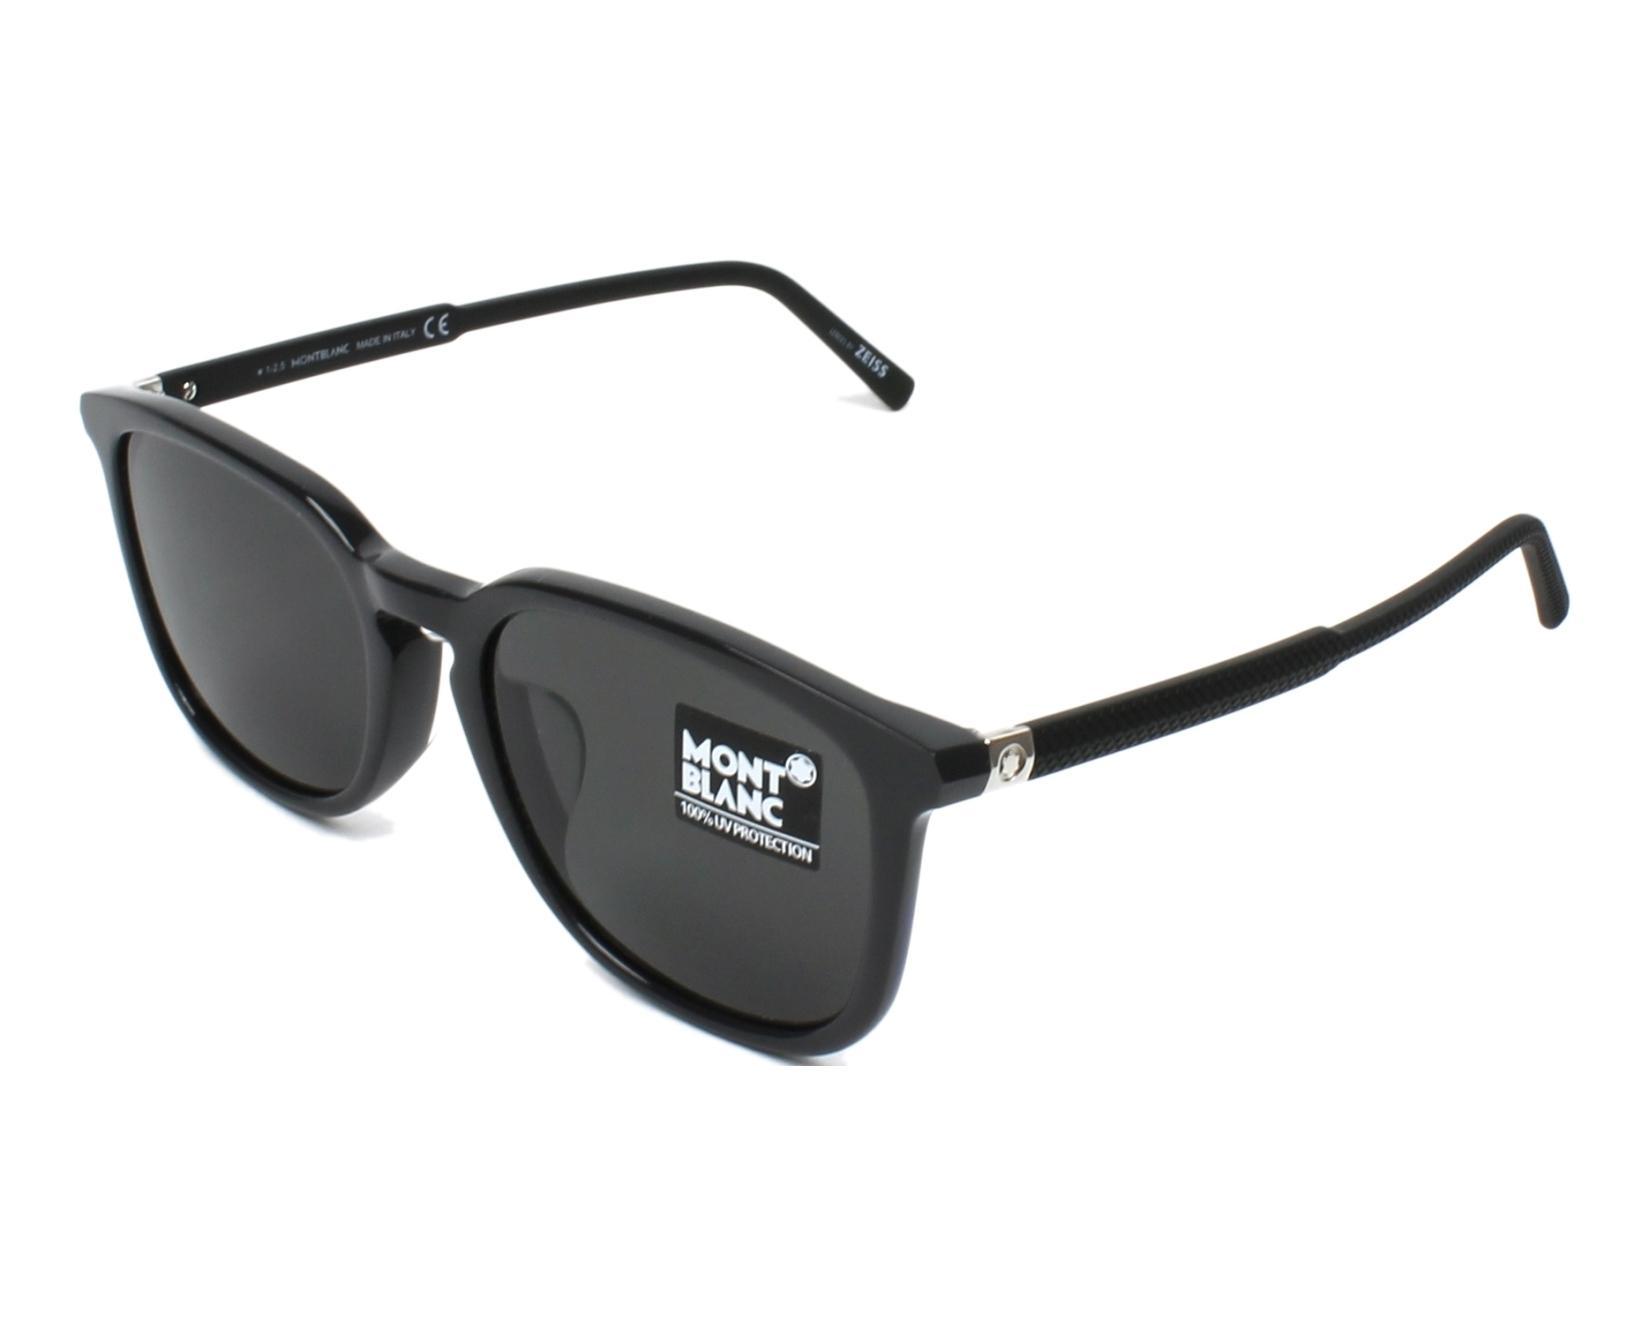 da5293cc3c Sunglasses Mont Blanc MB-586-S 20A 55-19 Grey Black profile view